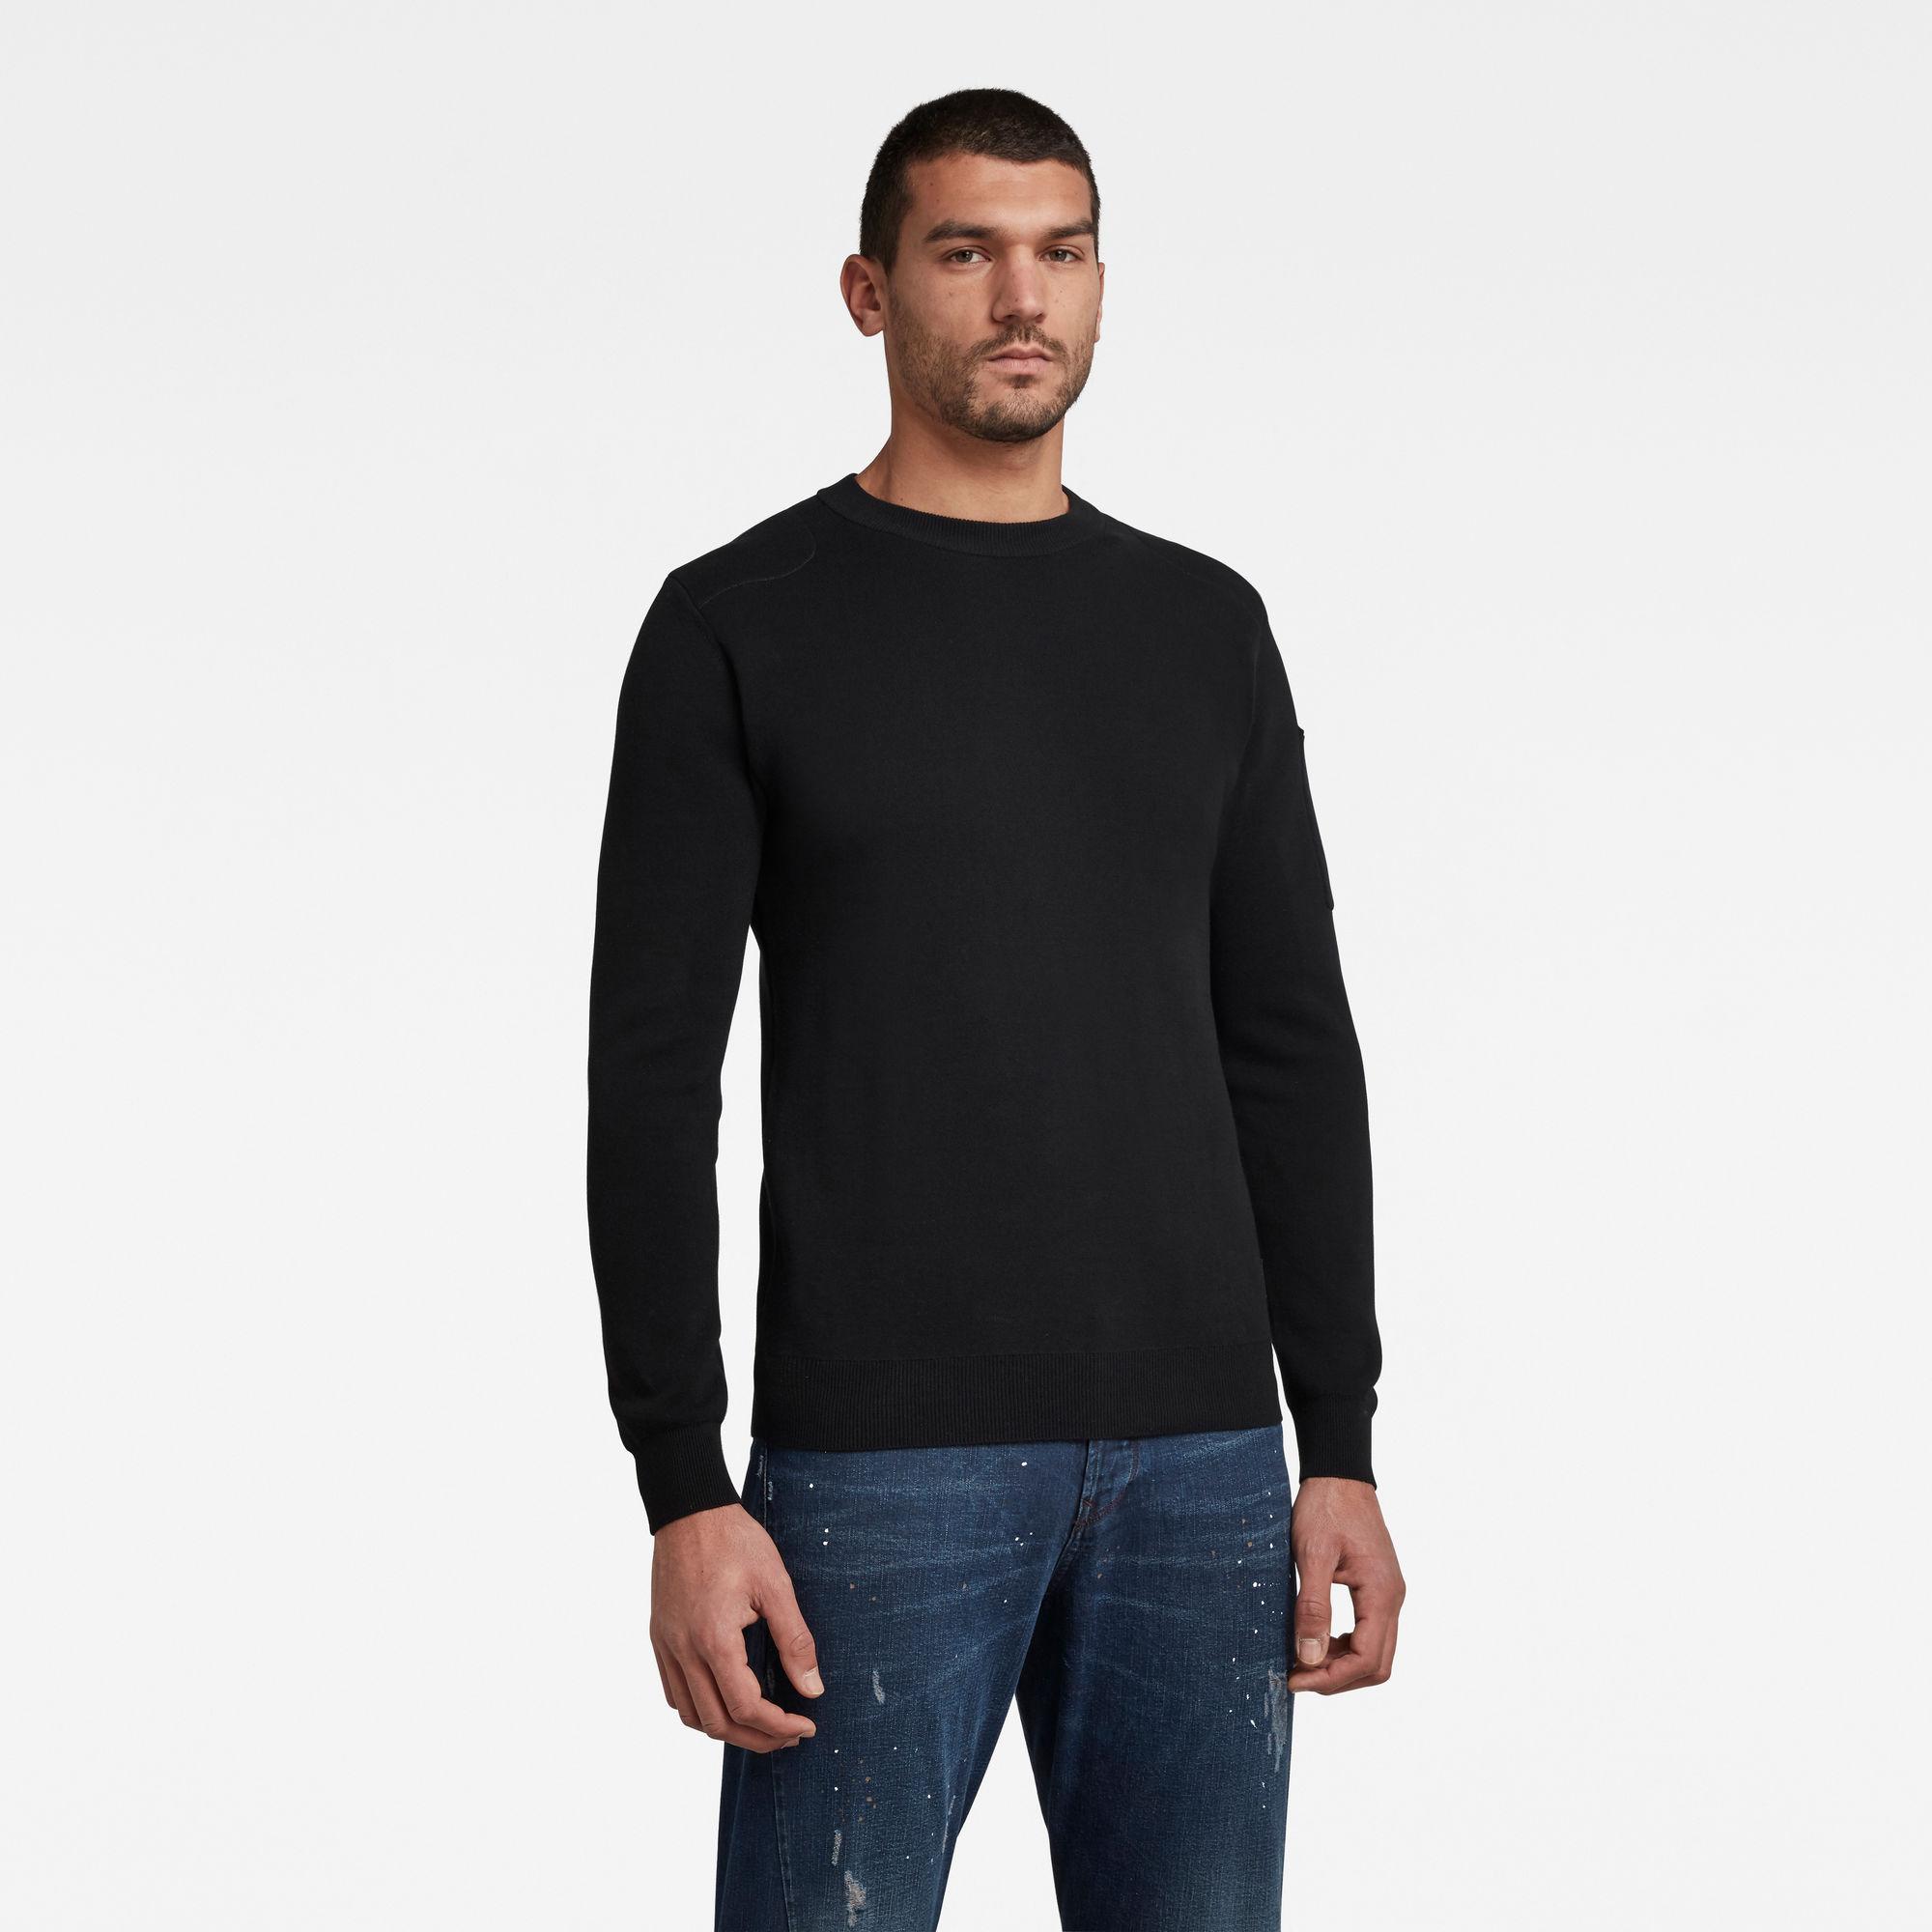 G-Star RAW Heren Sleeve Pocket Knitted Sweater Zwart